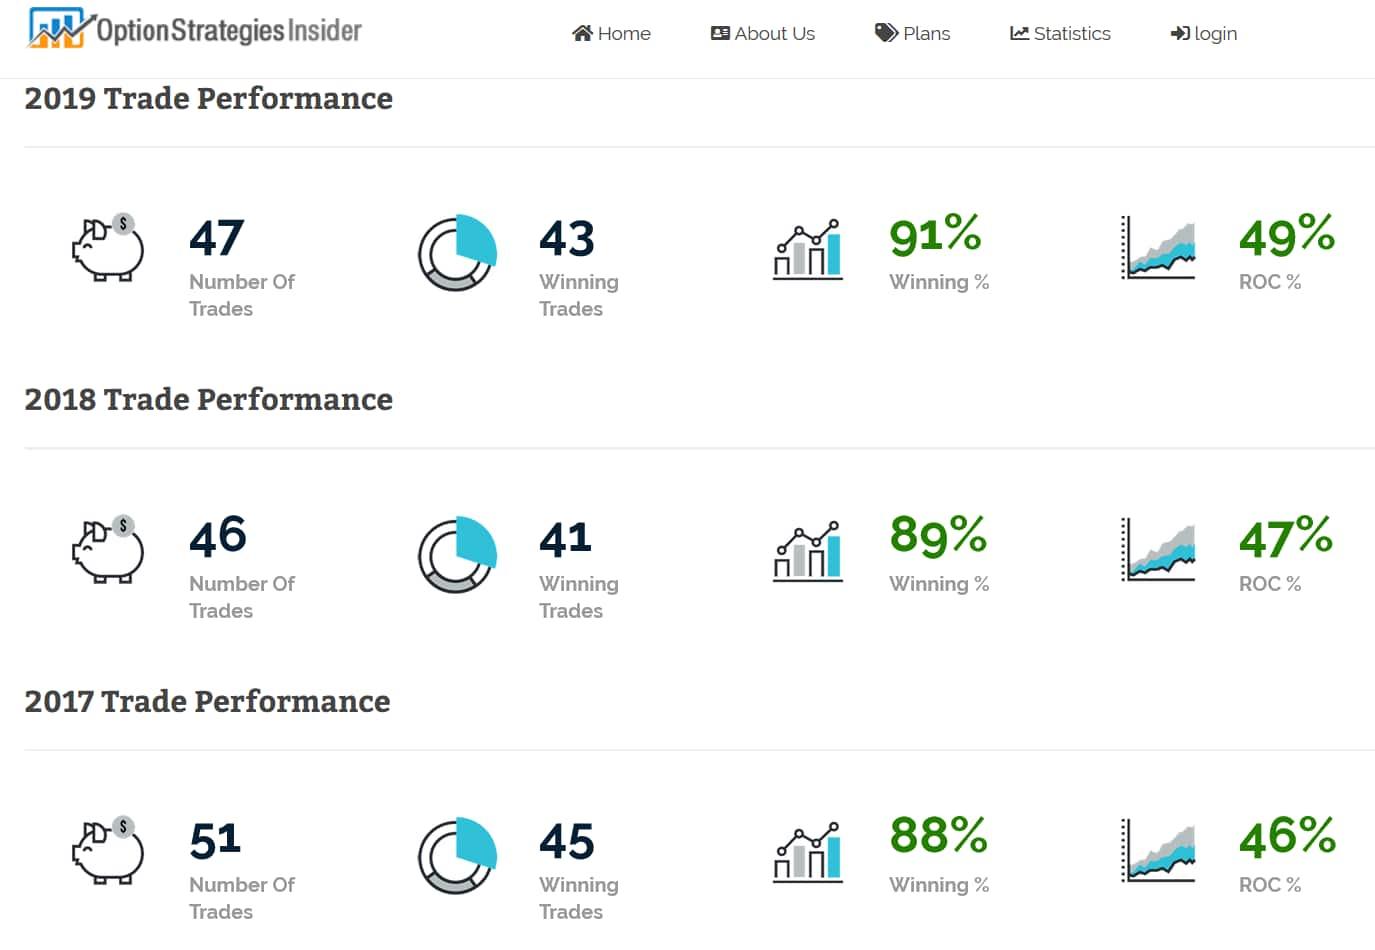 Option Strategies Insider Performance